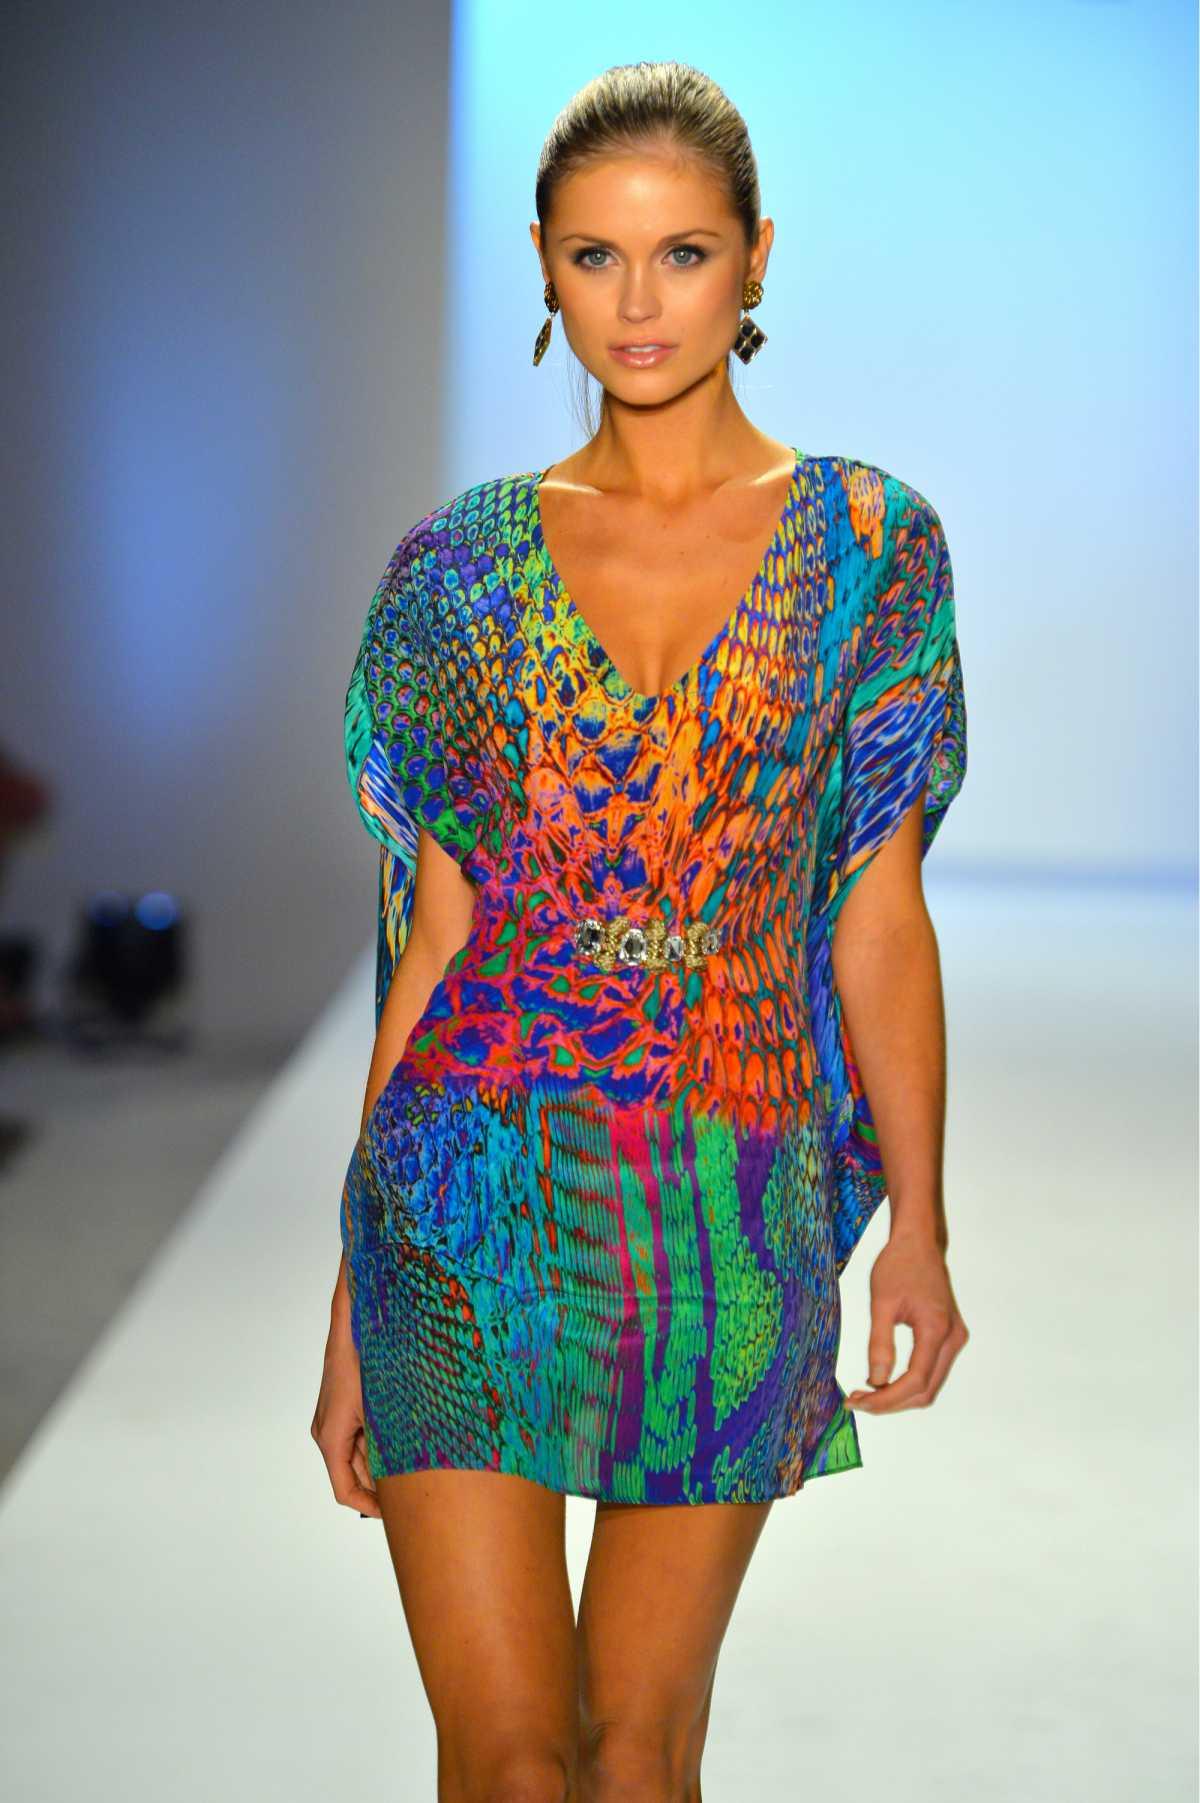 dress com estampa colorida animal print